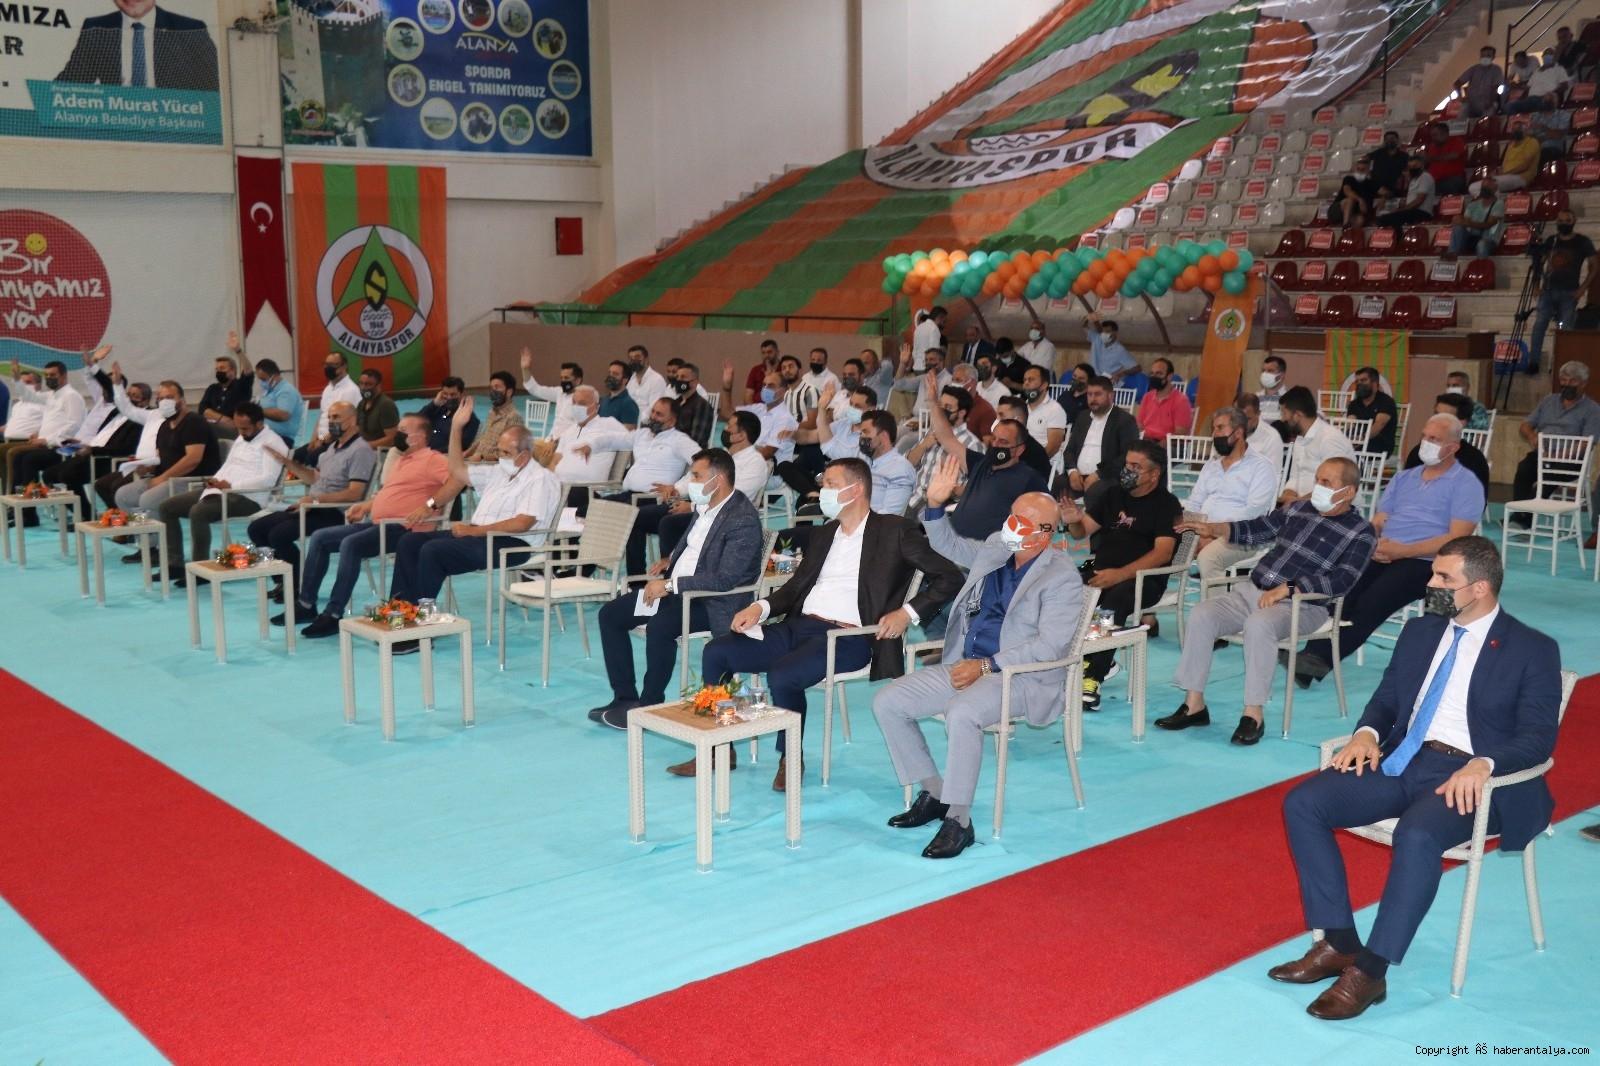 2021/06/alanyasporda-hasan-cavusoglu-guven-tazeledi-20210609AW34-12.jpg